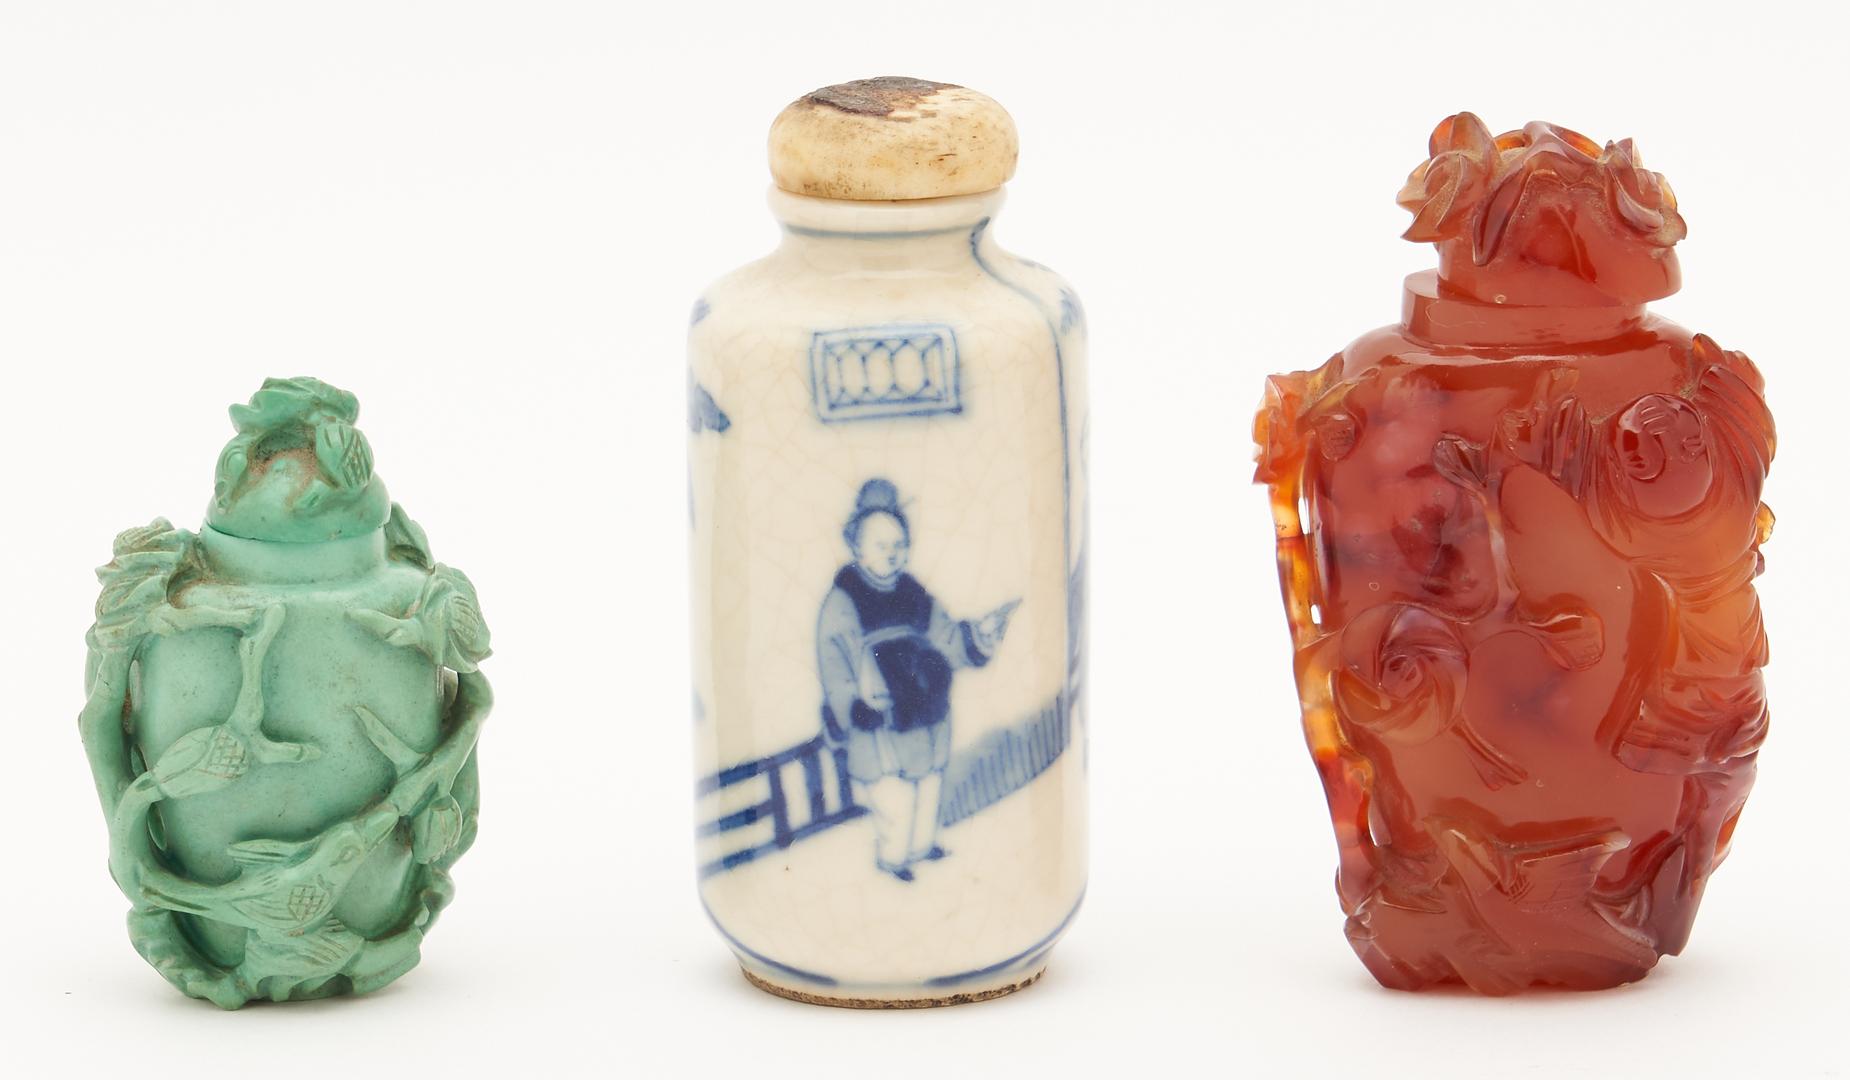 Lot 24: 3 Chinese Snuff Bottles, Hardstone & Porcelain